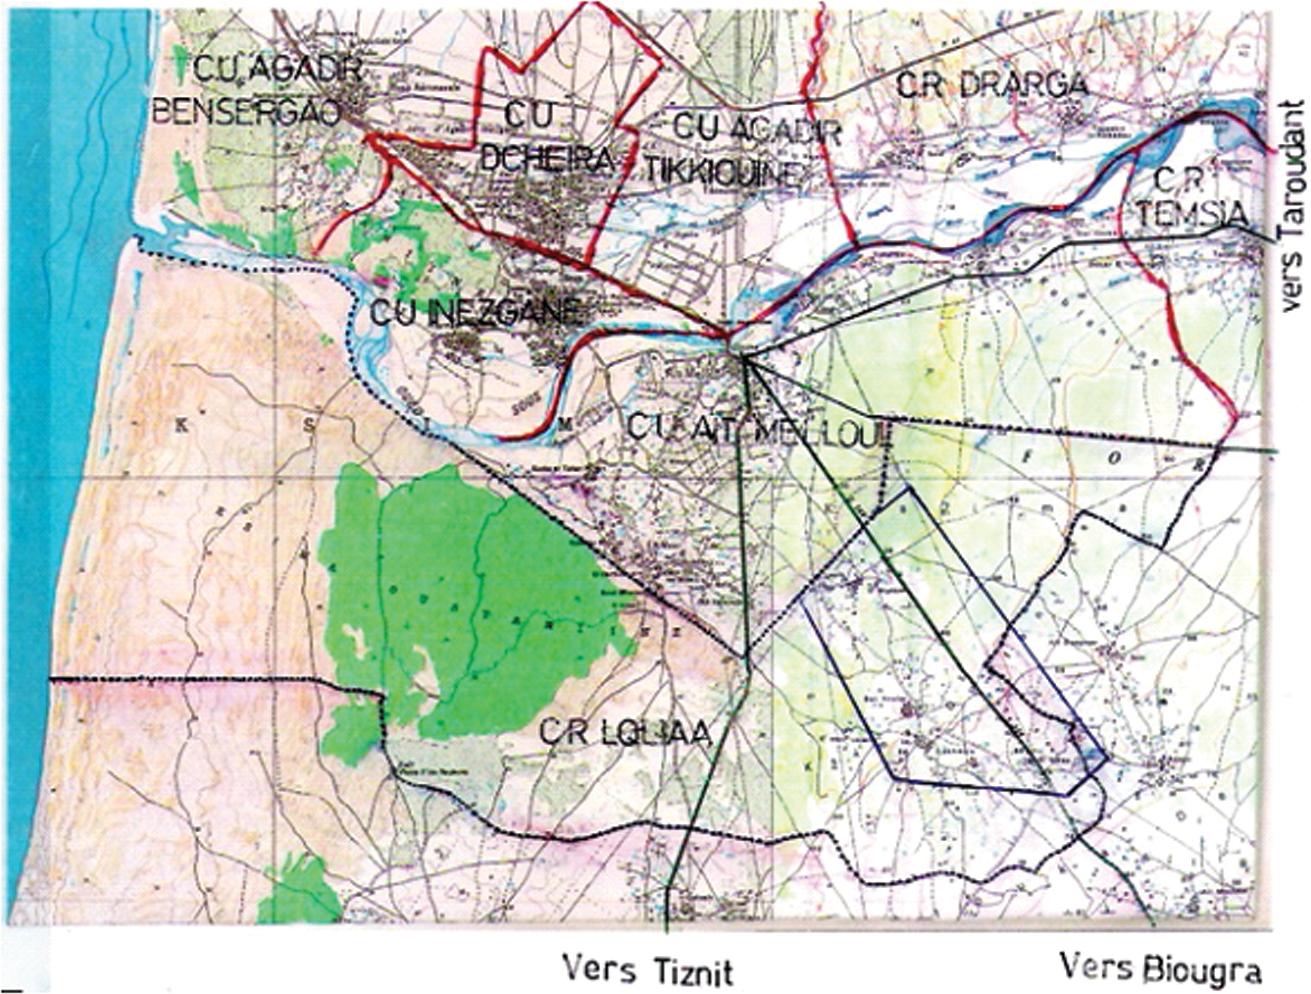 lqliaa maps